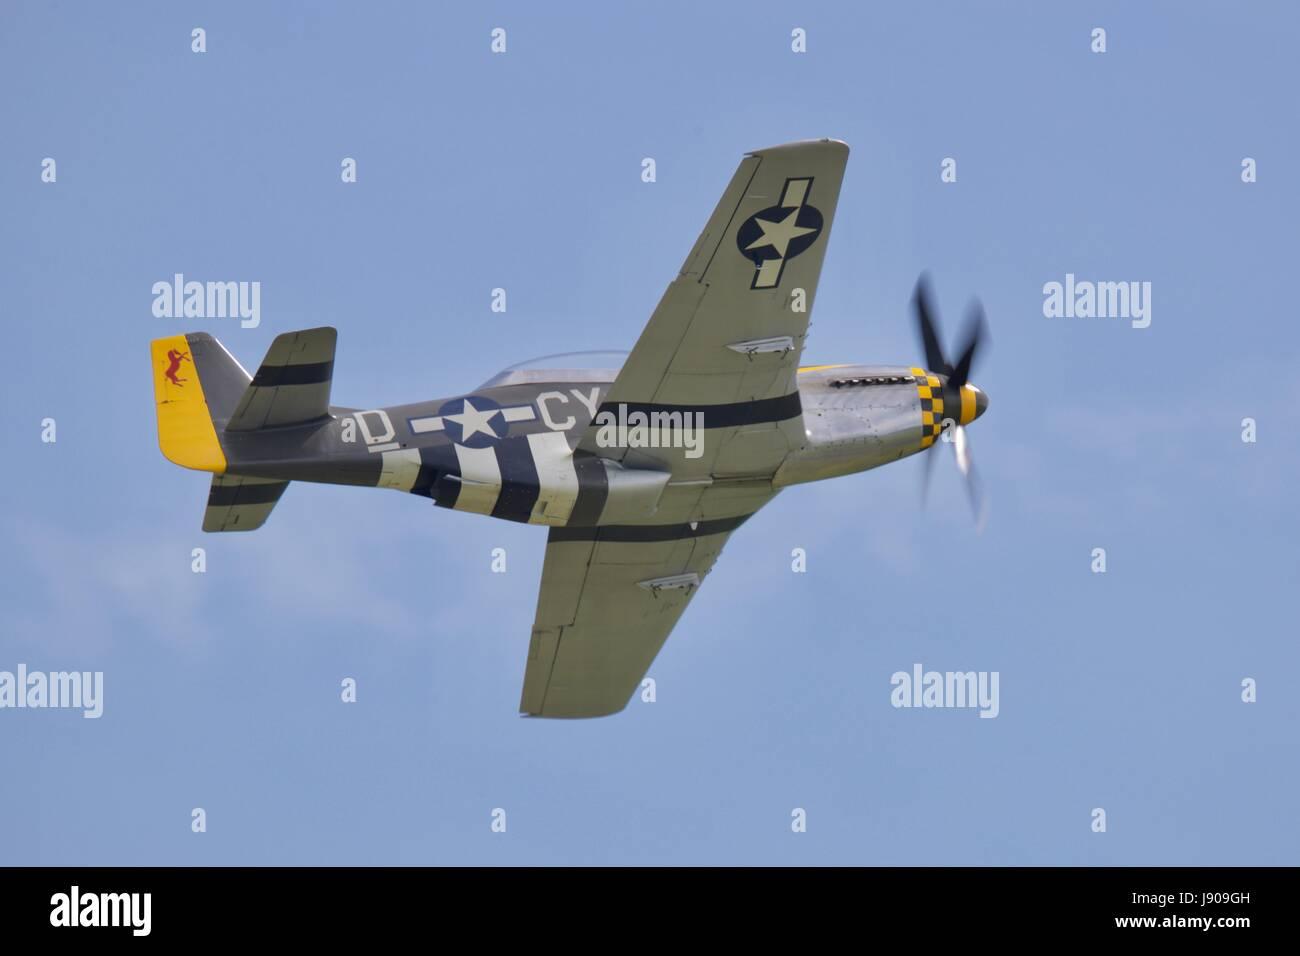 North American P-51 Mustang 'Miss Velma' - Stock Image